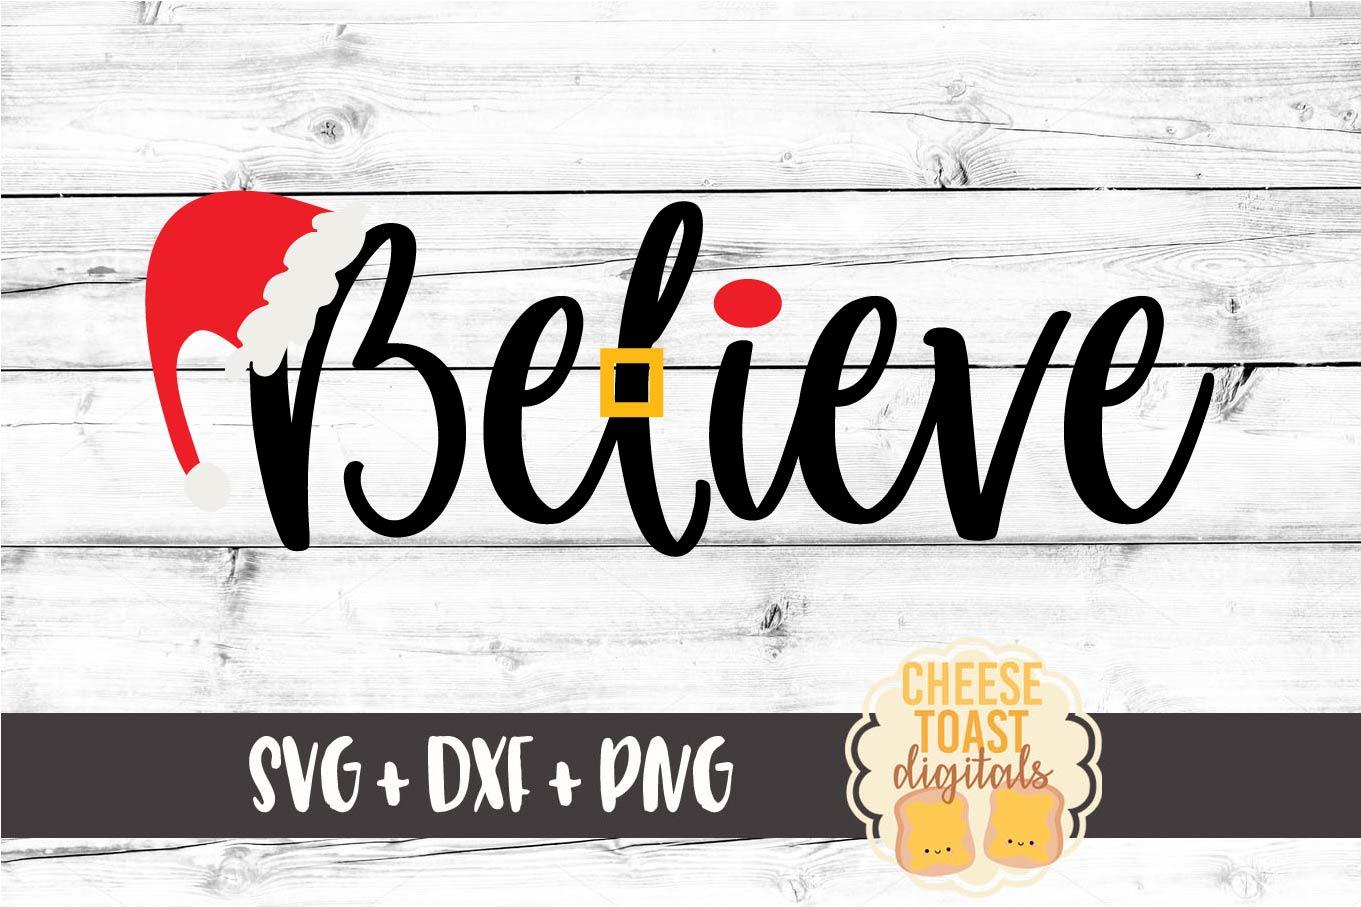 Believe - Christmas SVG Files - Santa example image 2